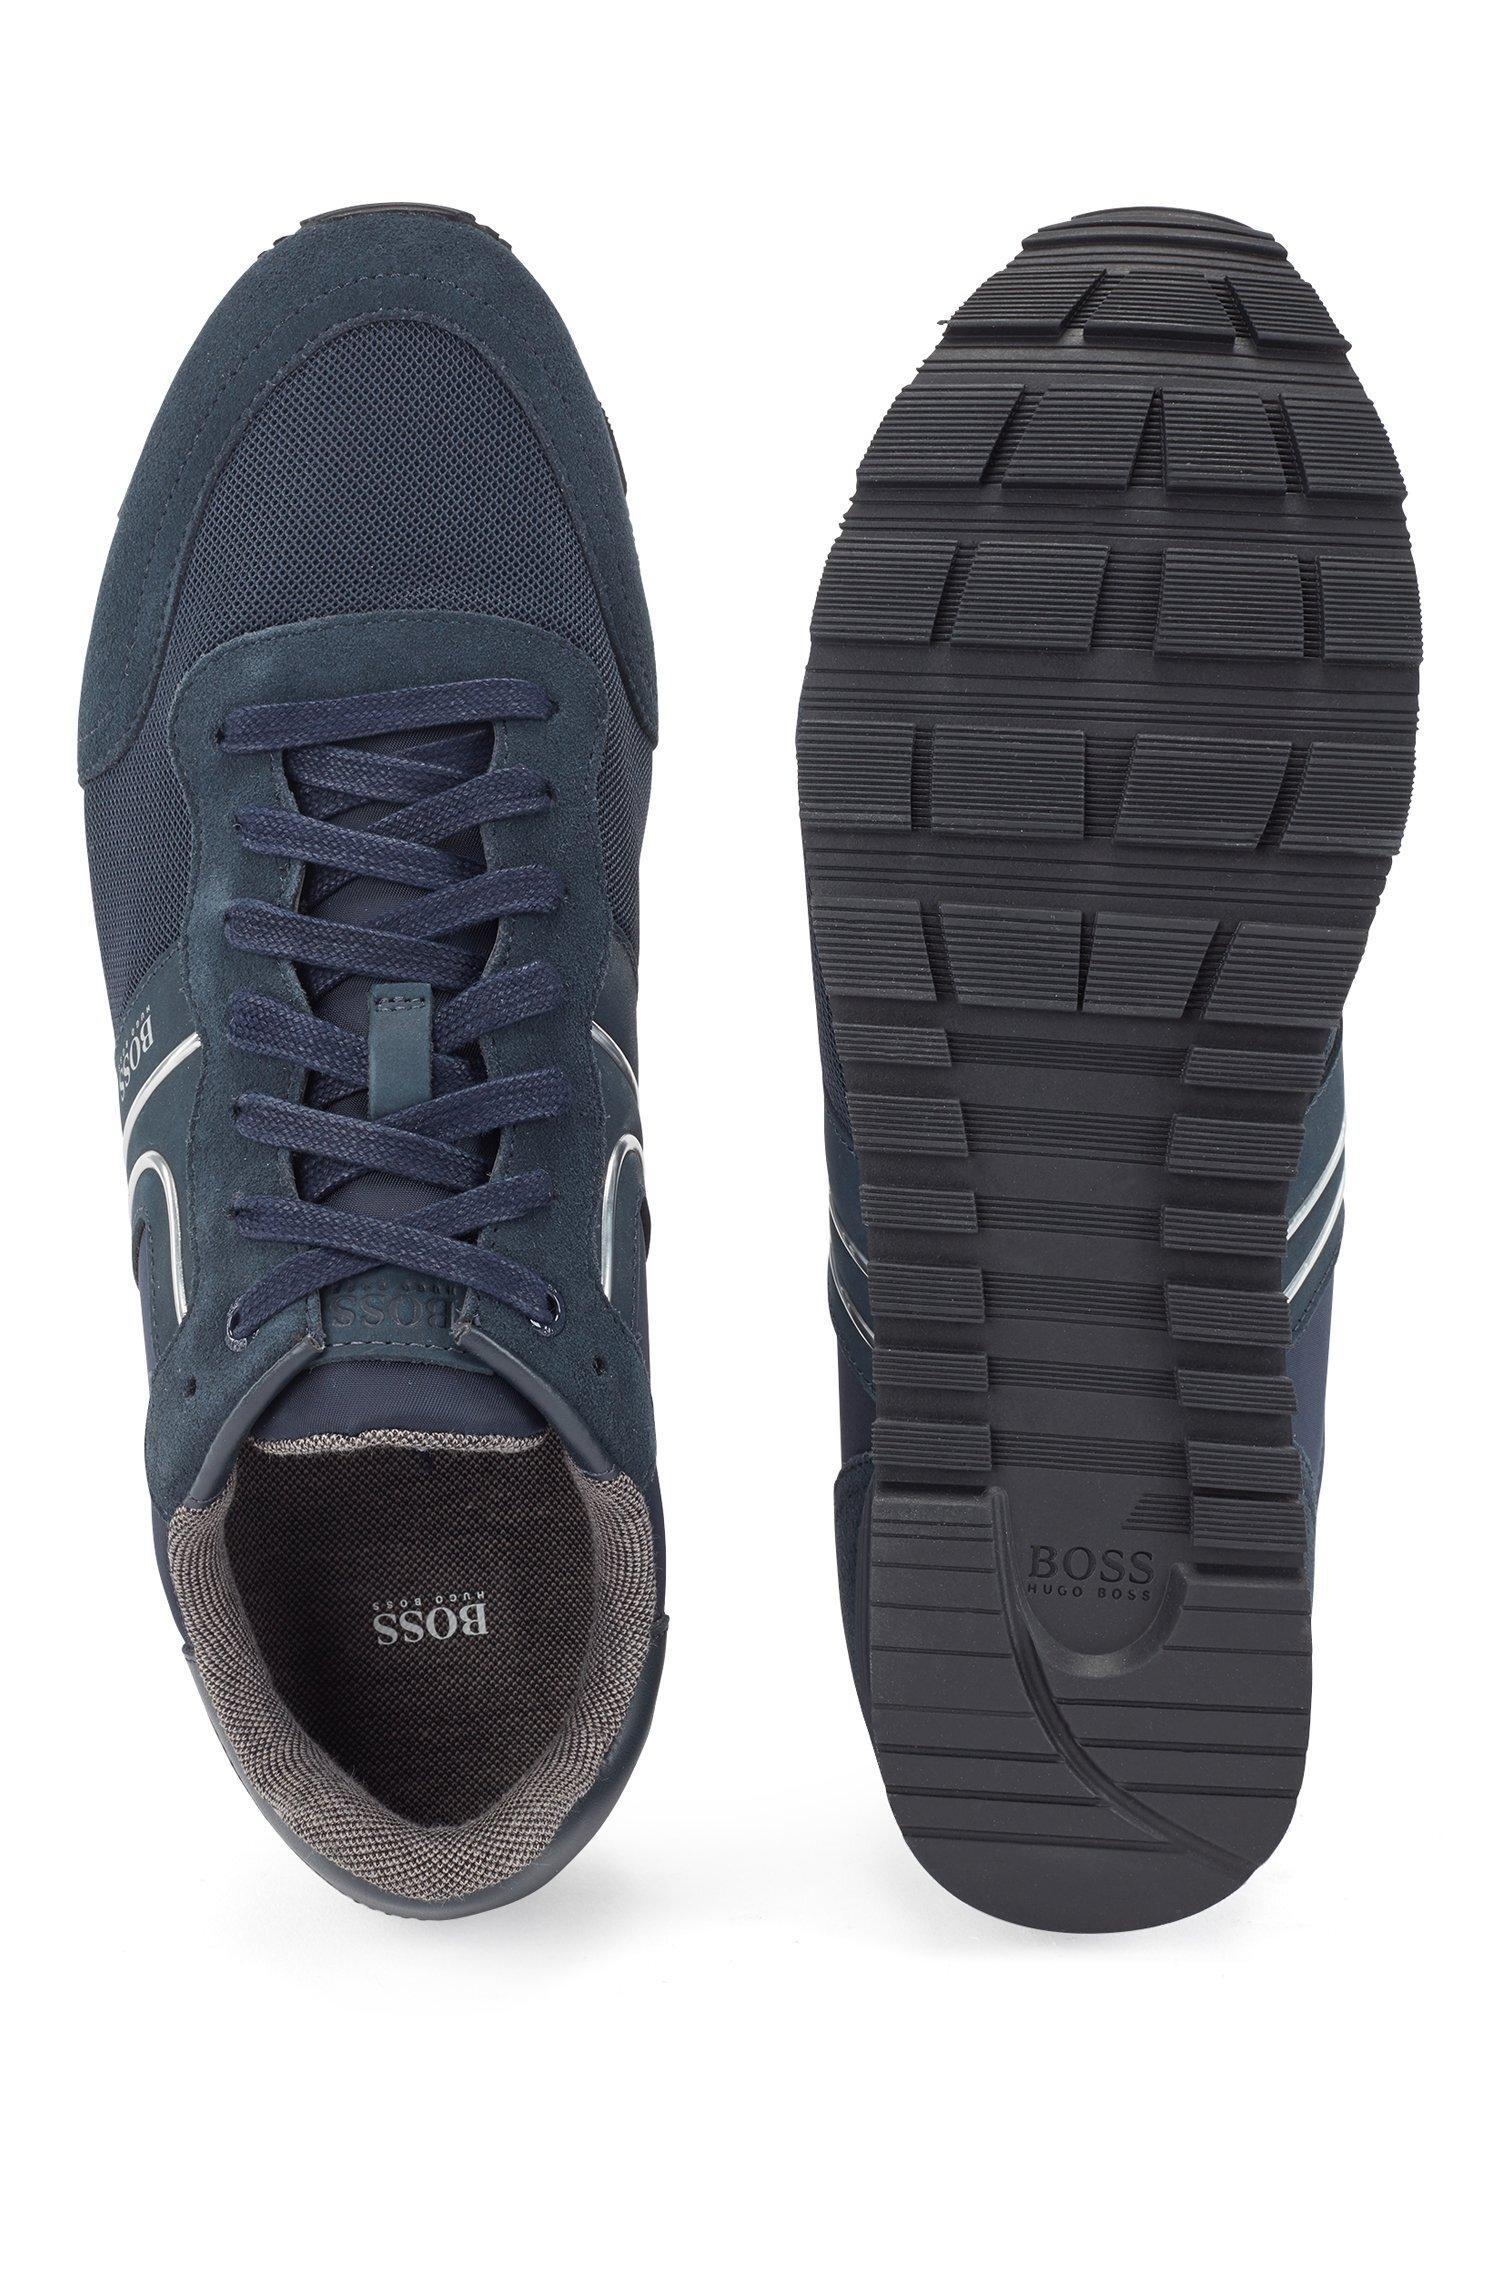 Hugo Boss Running-style sneakers, dark blue, 44